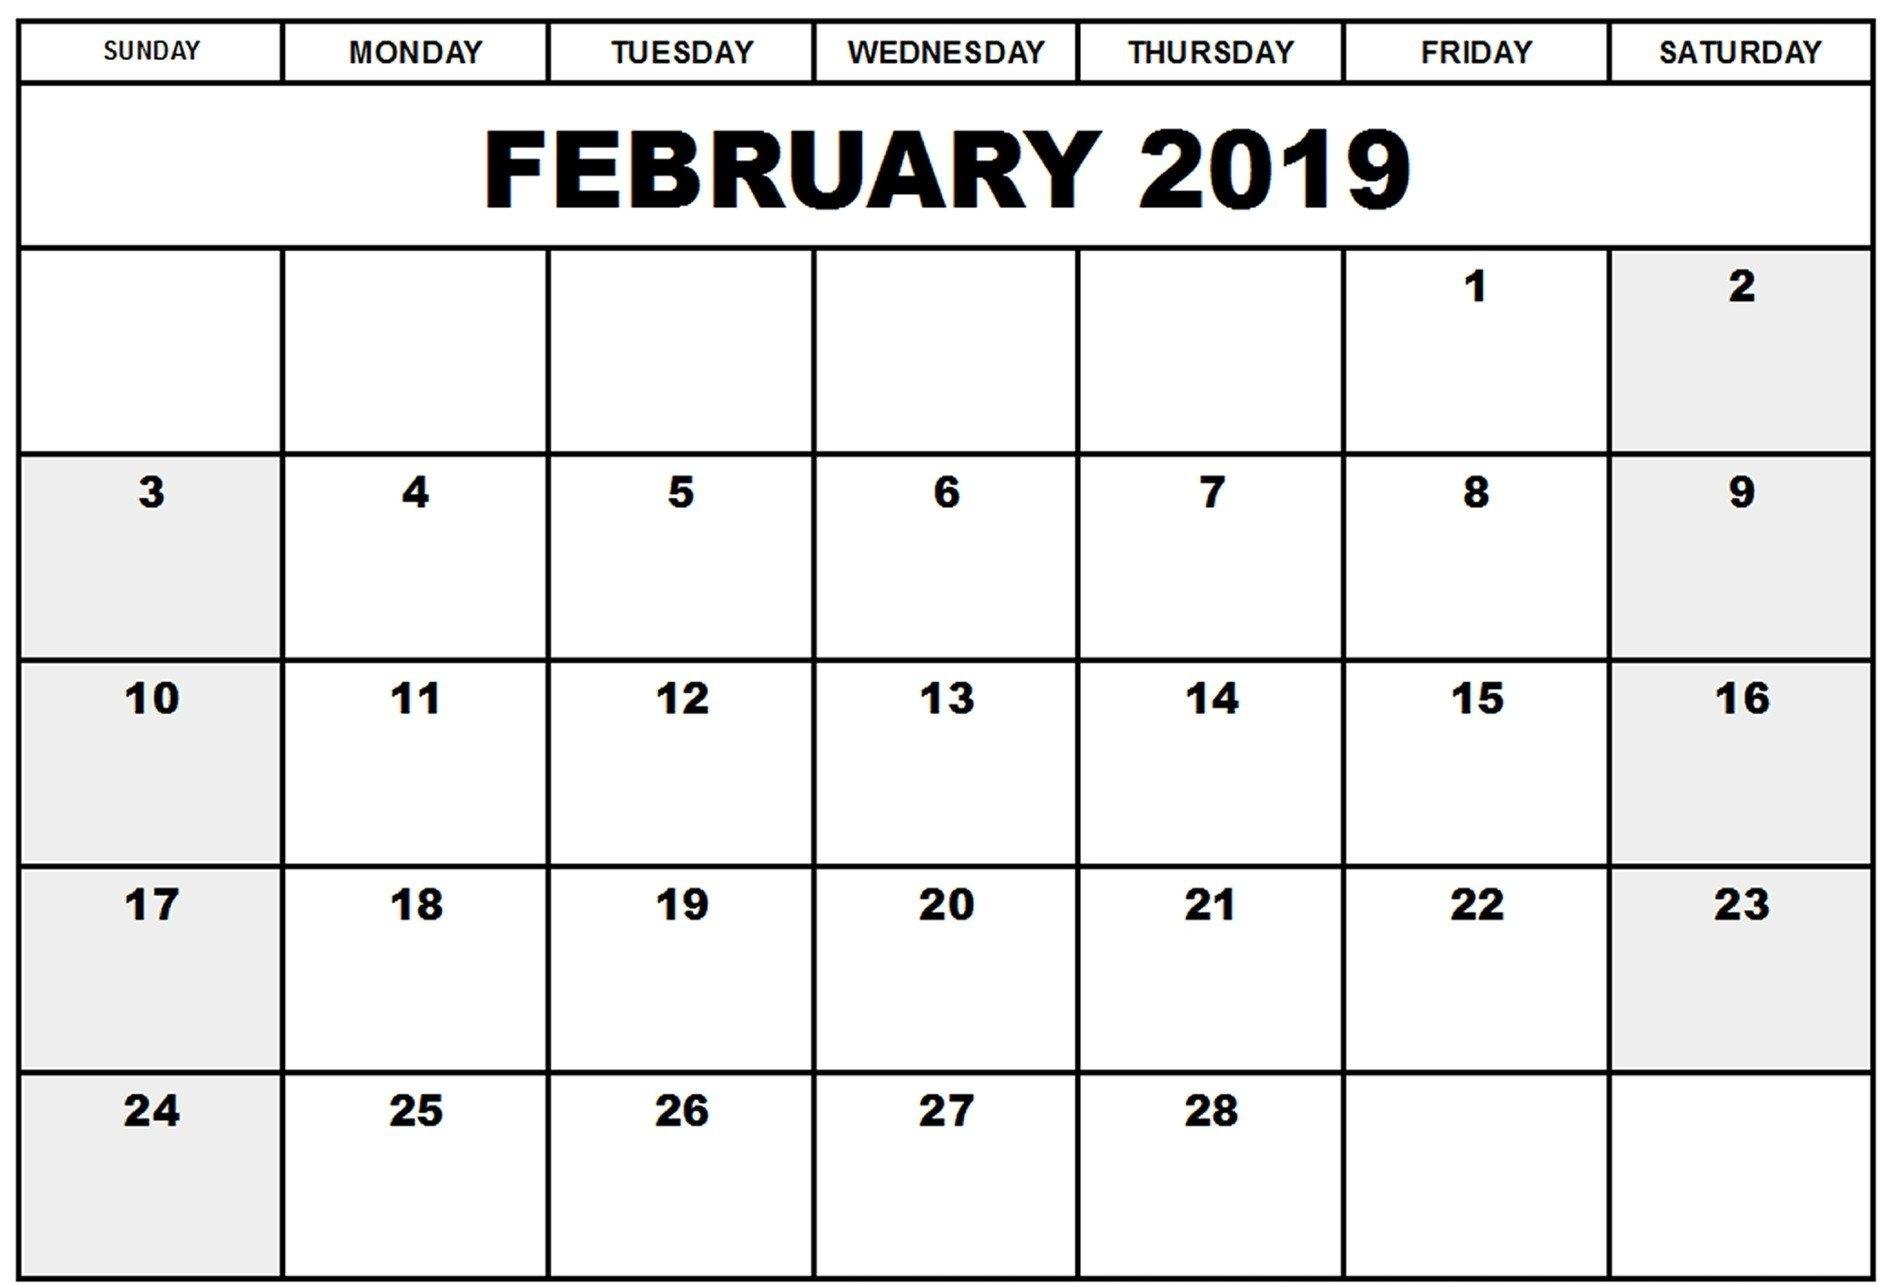 Online February 2019 Calendar Doc - Printable Calendar Templates Calendar 2019 Fillable